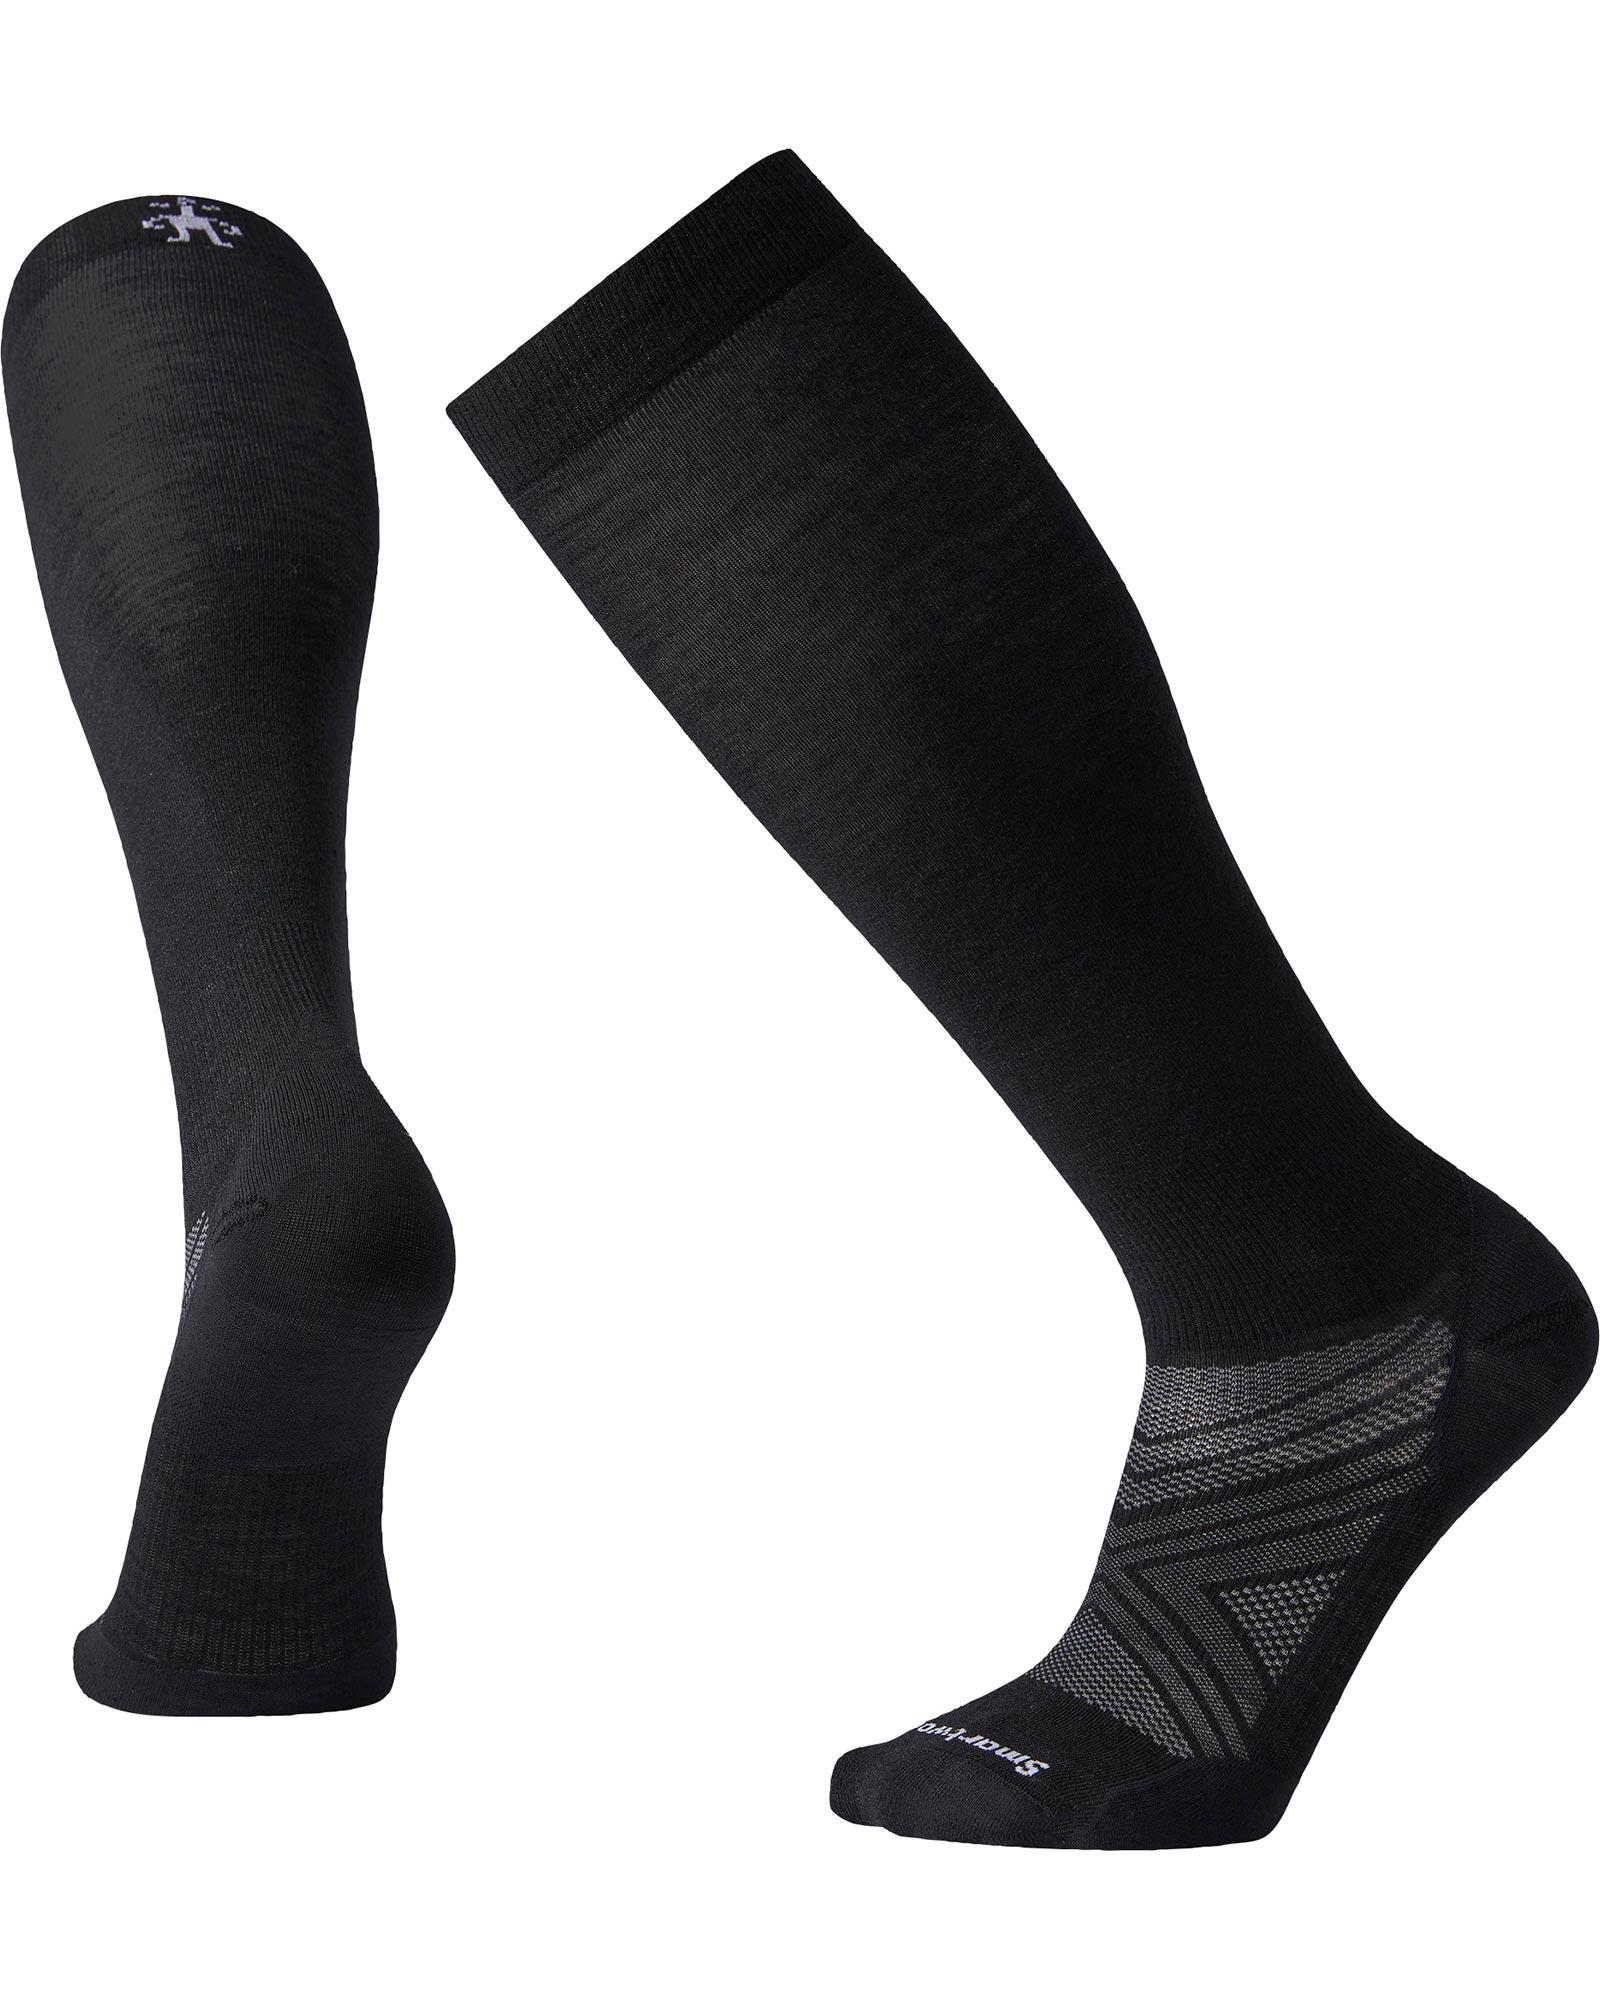 Smartwool PhD Ski Ultra Light Socks 0